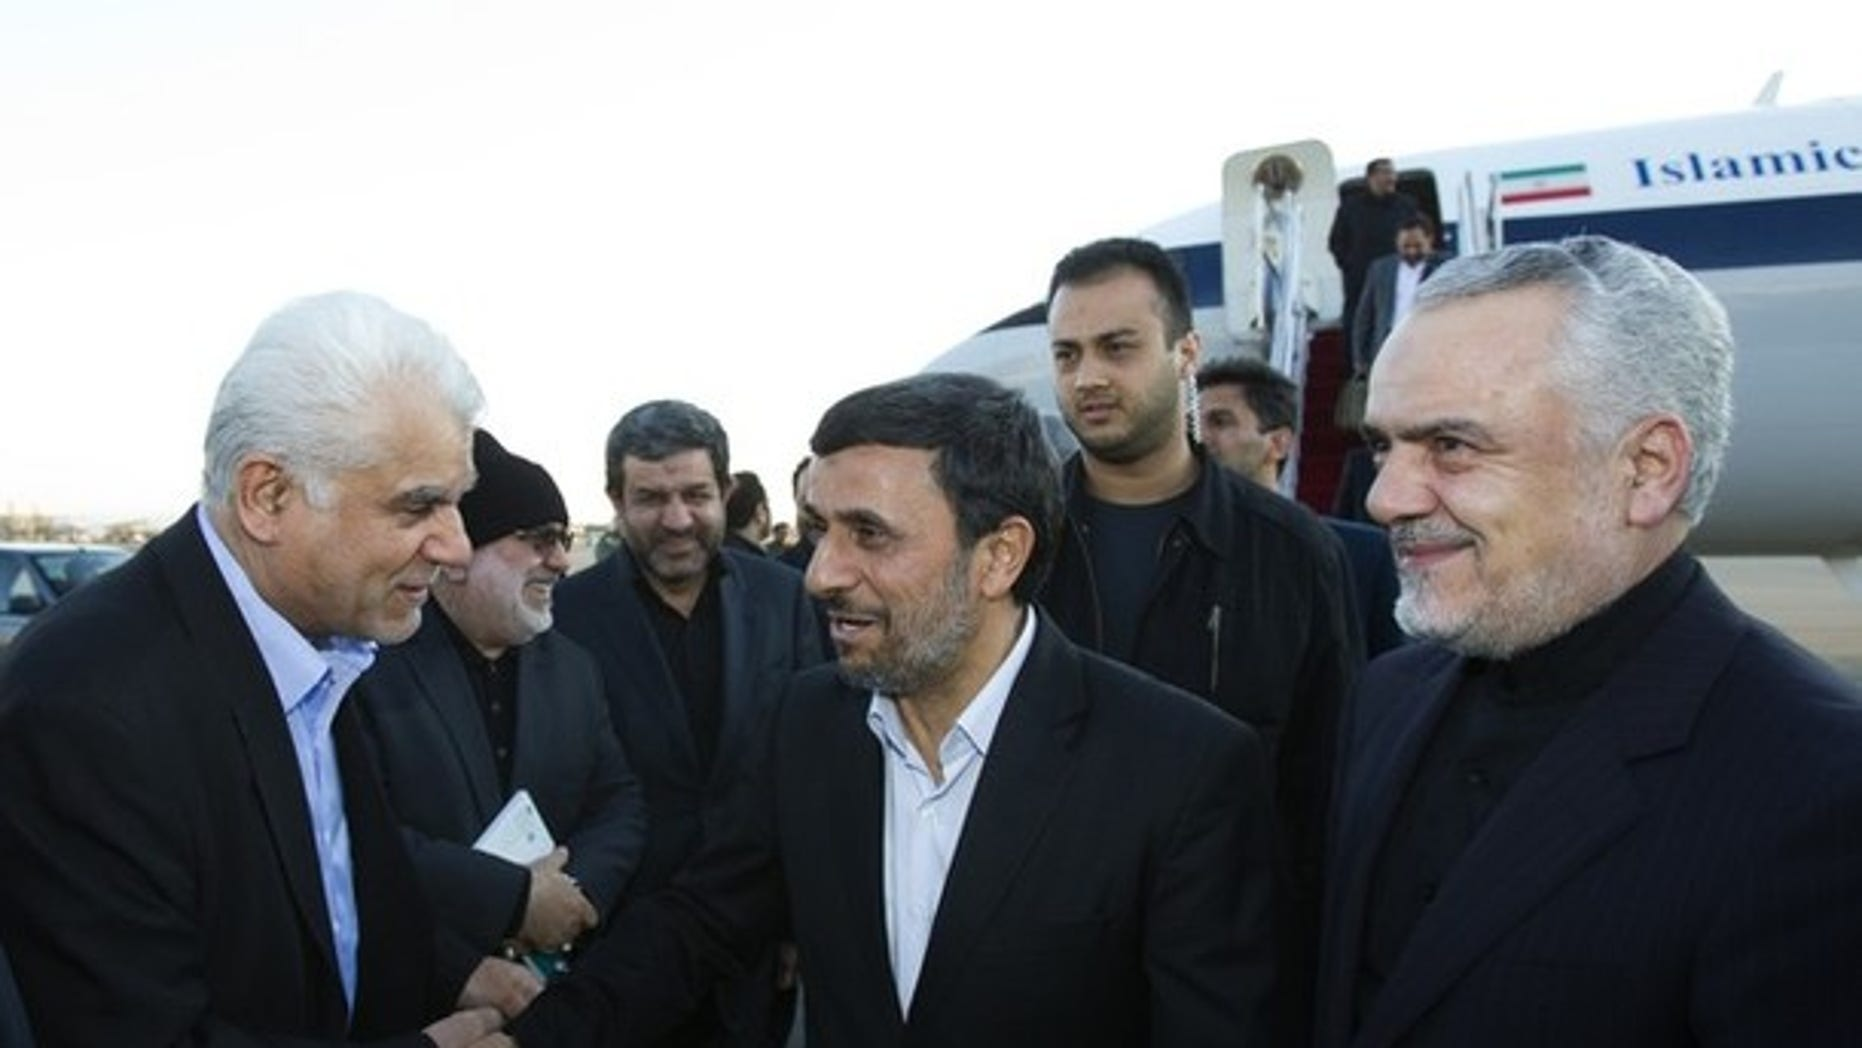 Jan. 14, 2012: Iran's President Mahmoud Ahmadinejad (C) as First Vice President Mohammad Reza Rahimi looks on at Tehran's Mehrabad airport after Ahmadinejad's visit to Latin American countries